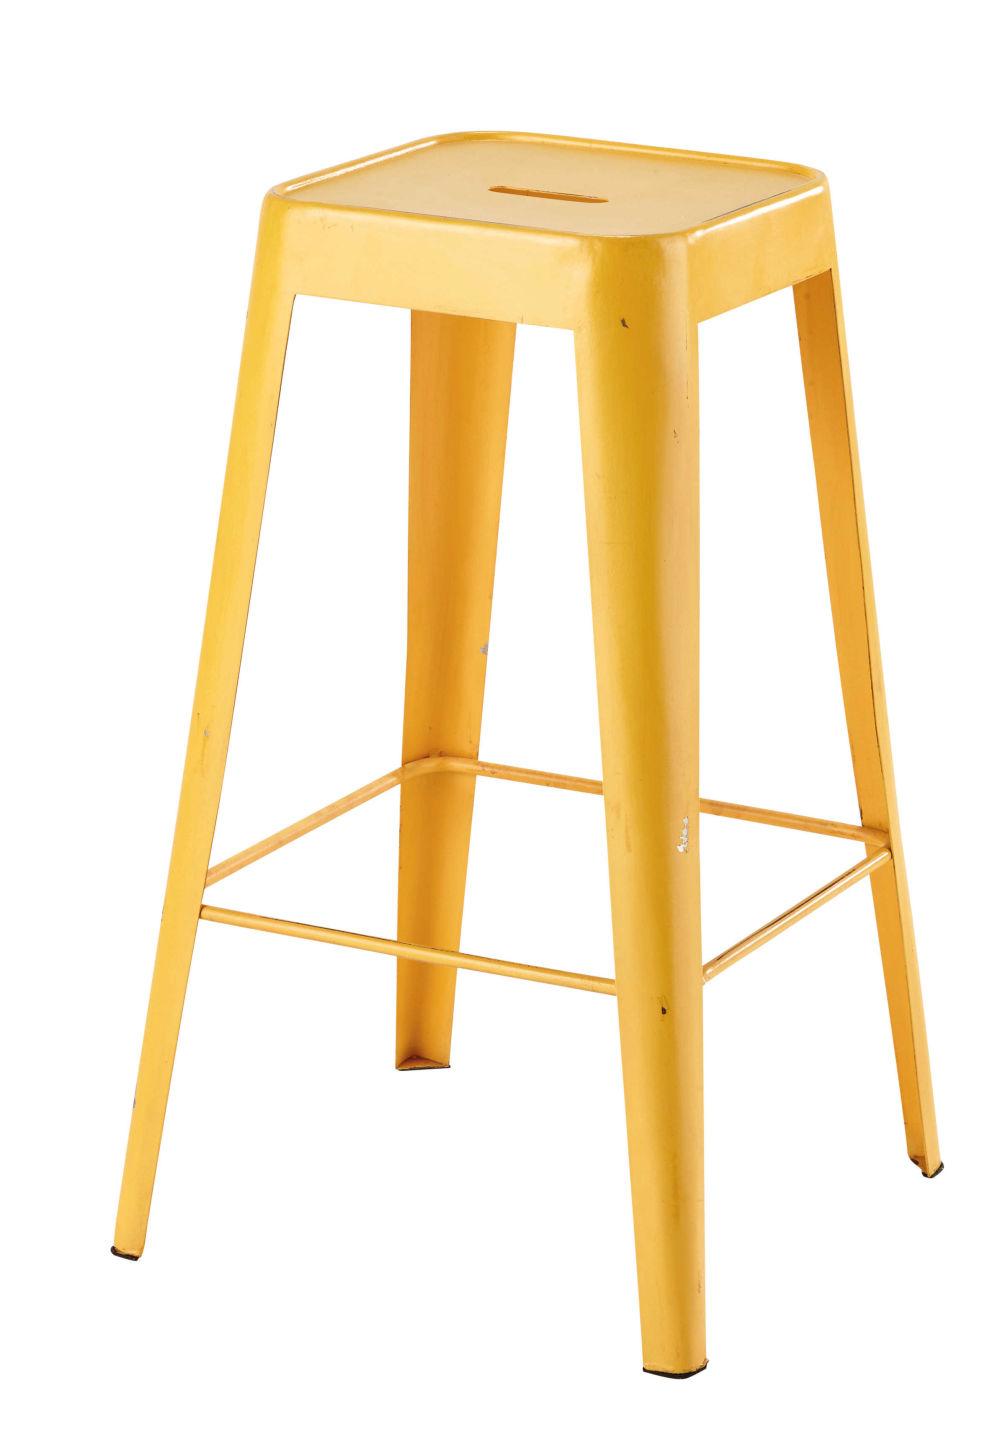 cheap tabouret de bar en mtal jaune with tabouret bar maison du monde. Black Bedroom Furniture Sets. Home Design Ideas